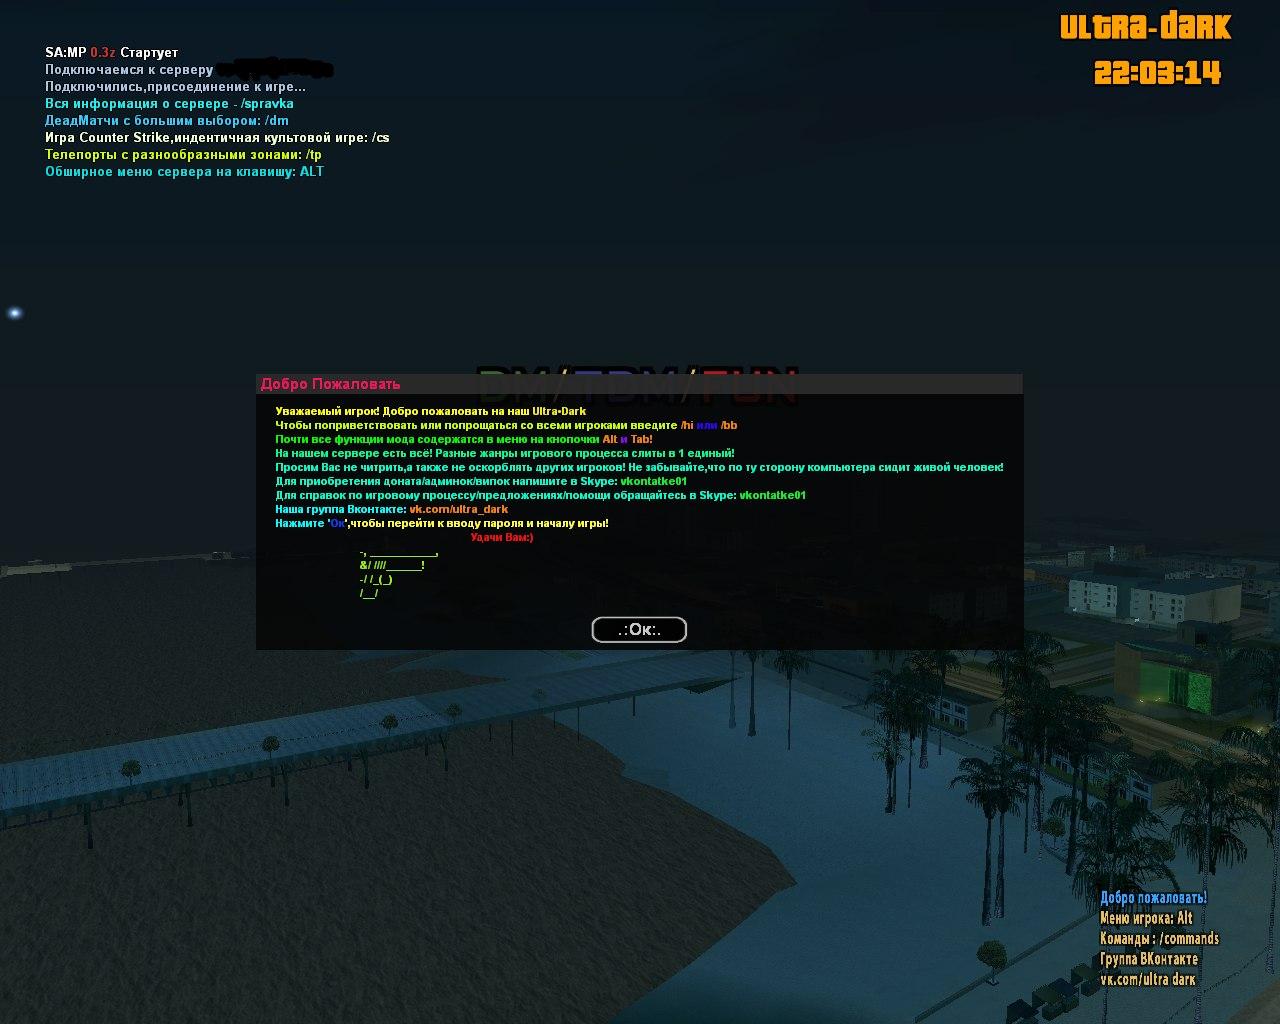 Хостинг самп сервера дм vps хостинг тест